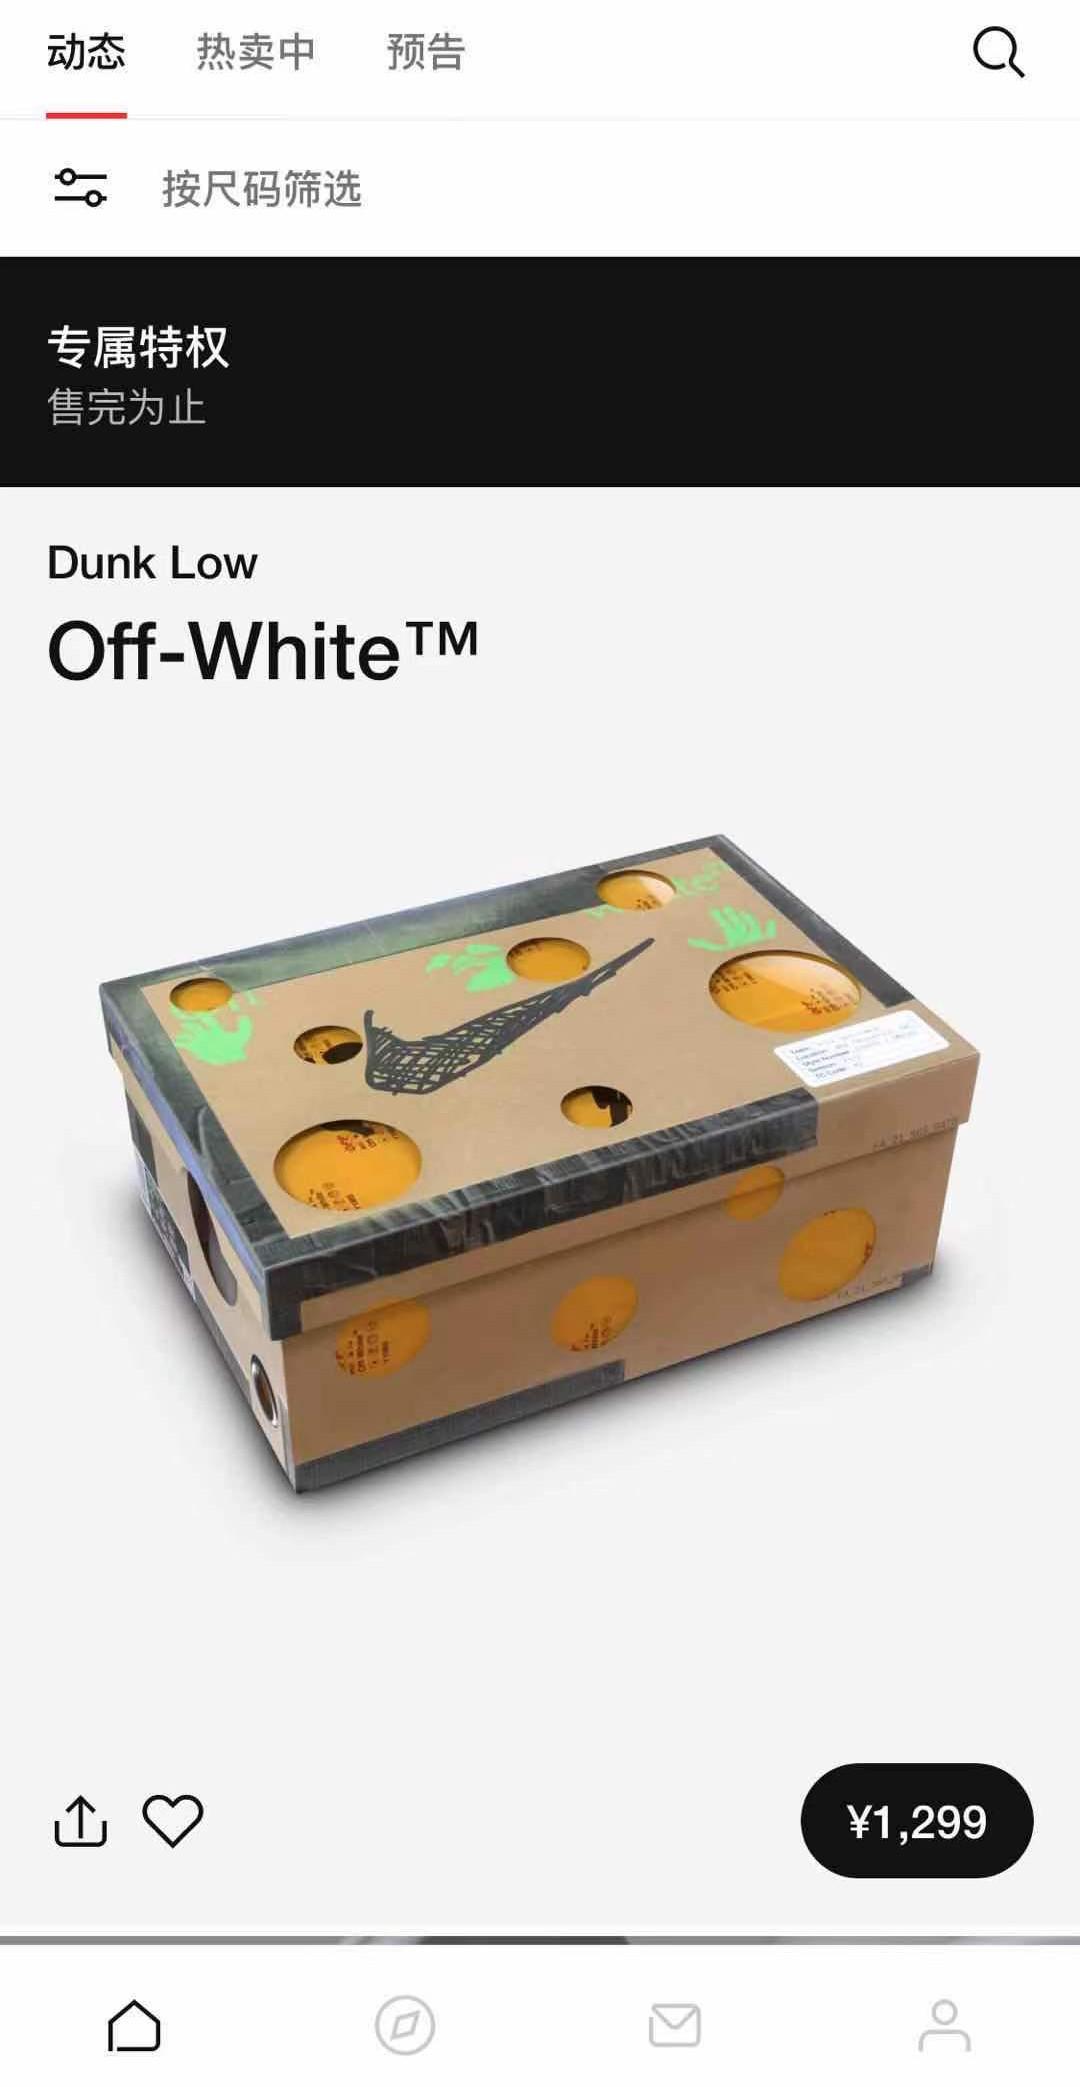 OFF-WHITE,Dunk,Nike,the 50  别急再等等!OFF-WHITE x Dunk 专属现已开始!